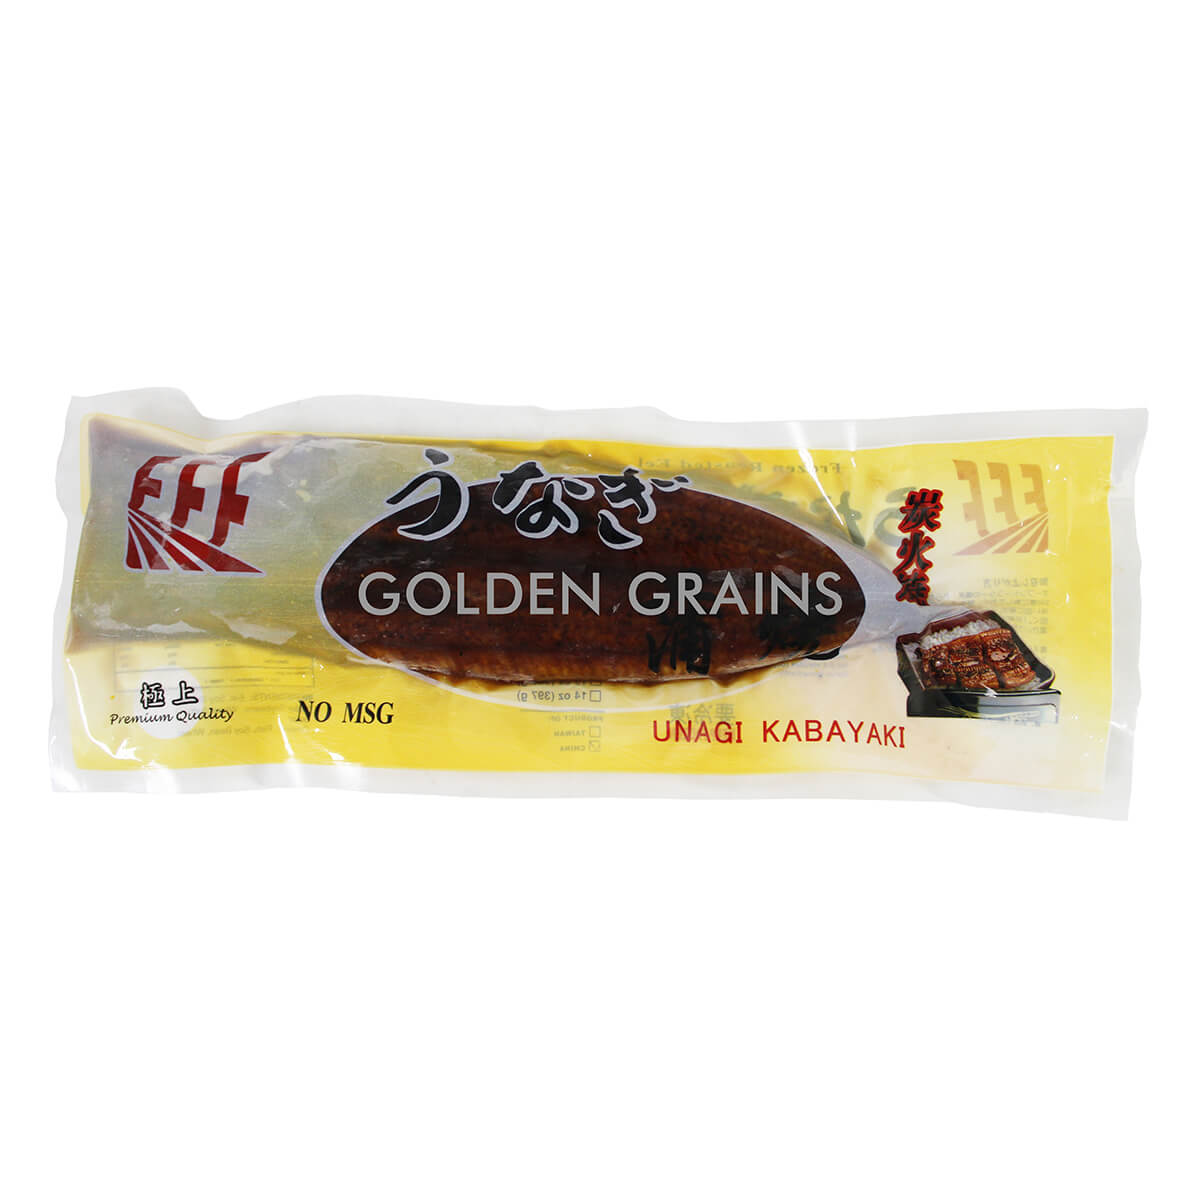 Golden Grains Unagi Kabayaki - 330G - China - Front.jpg